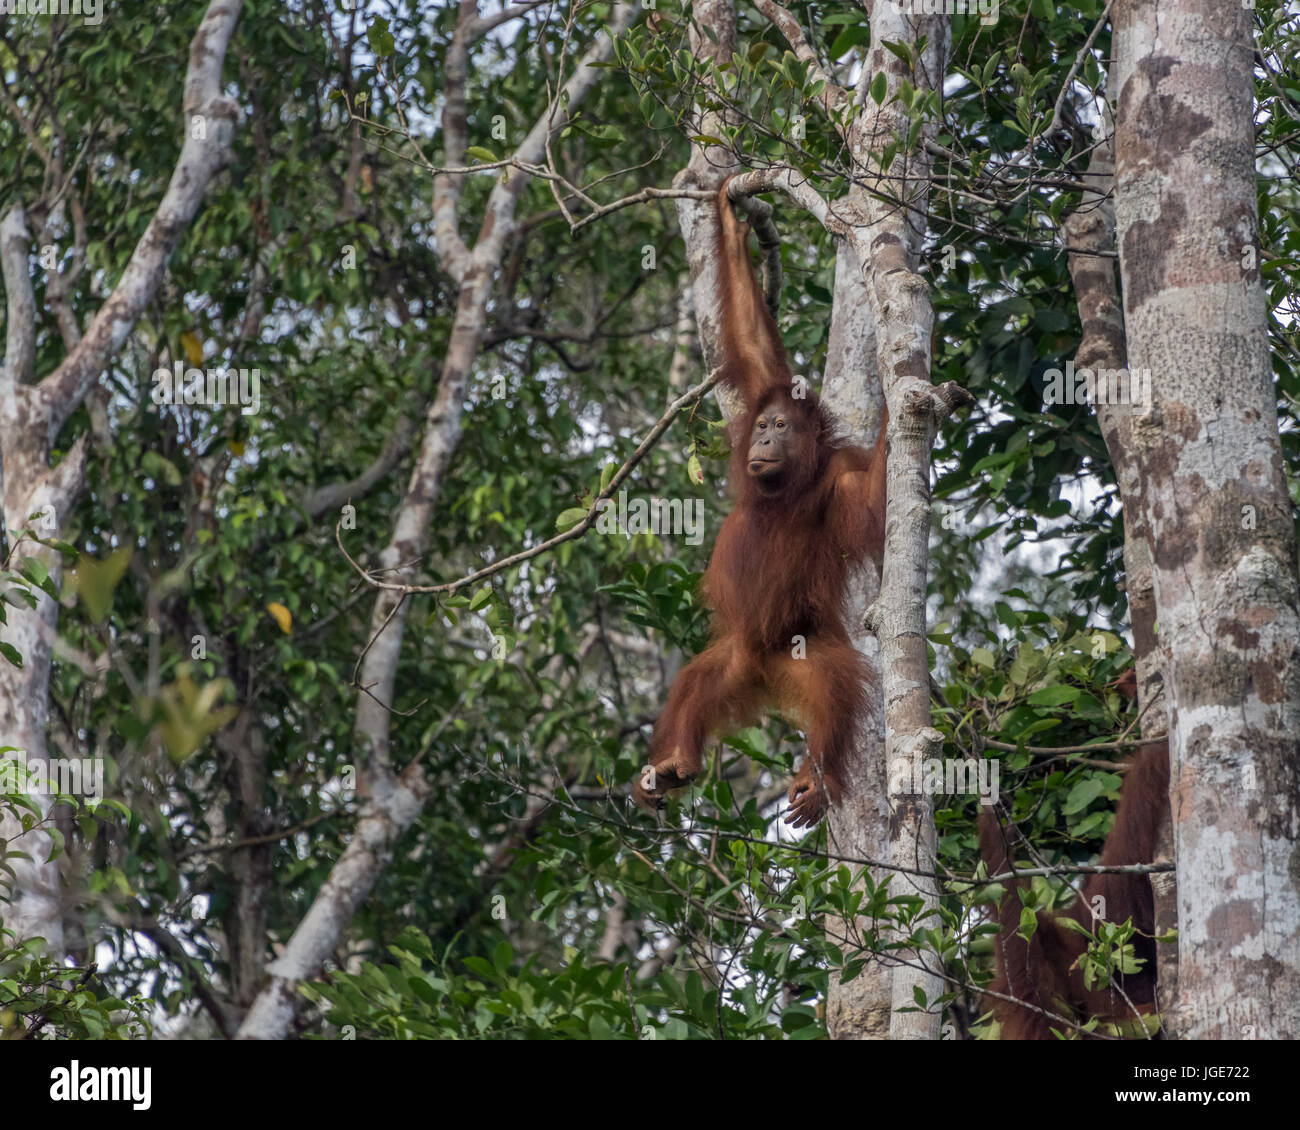 Giovani orangutan oscillanti in alberi, Tanjung messa National Park, Kalimantan, Indonesia Immagini Stock